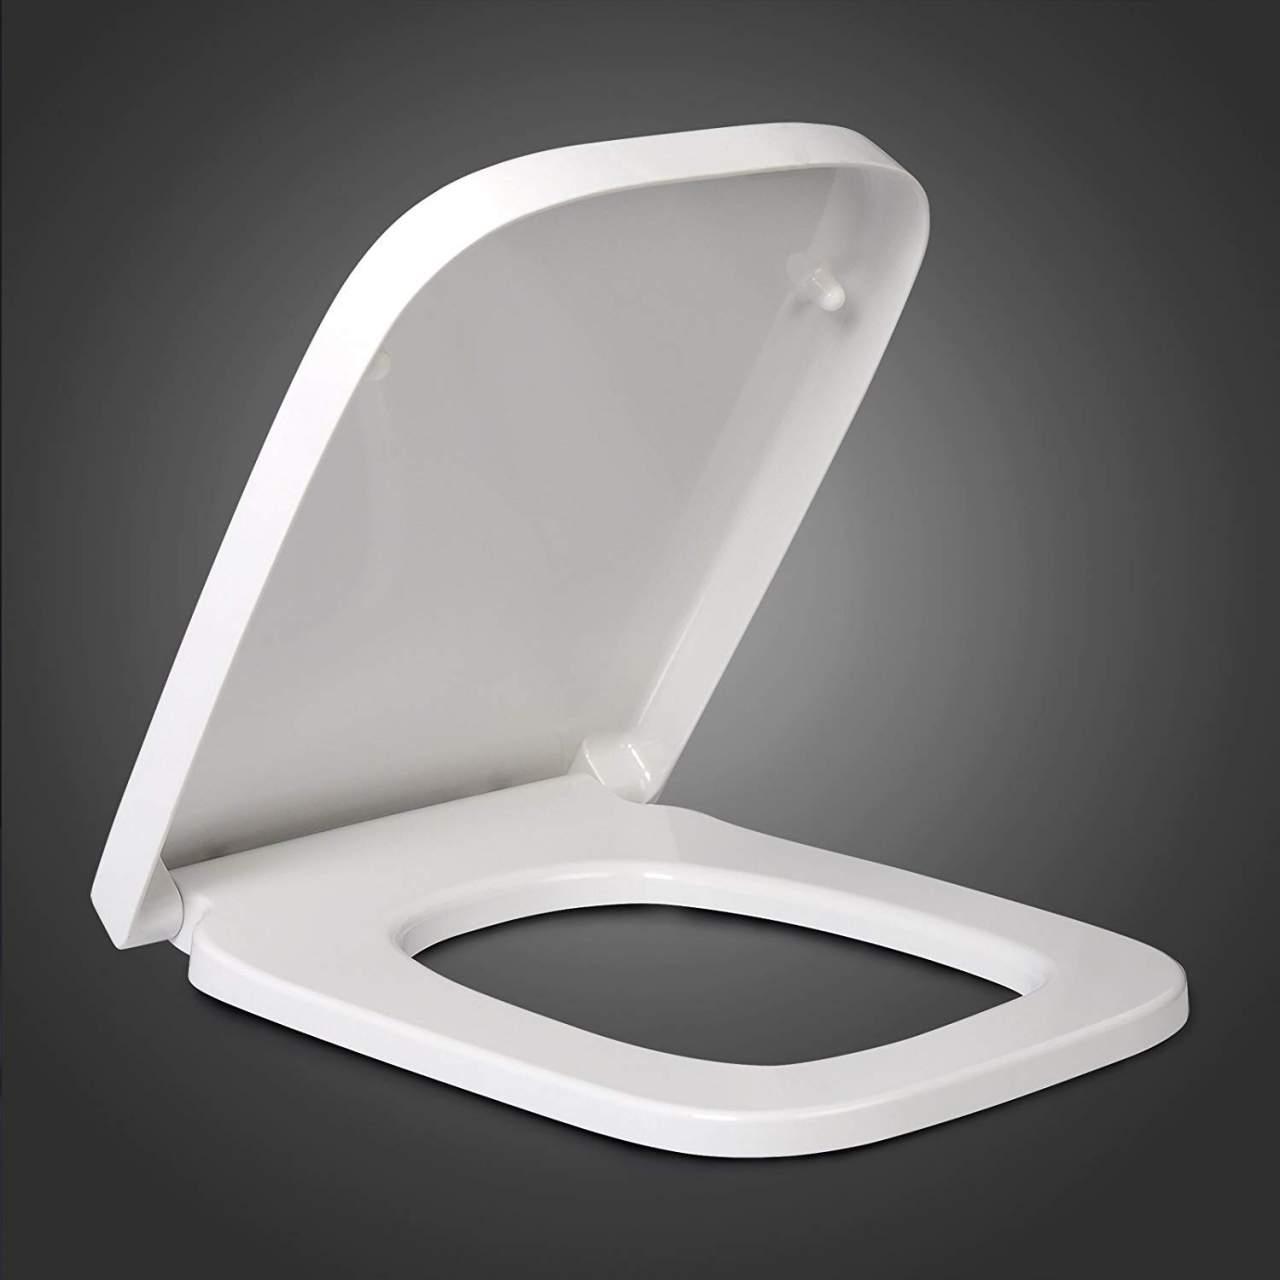 kelihood Toilettensitz O Typ Universal Warmer Toilettensitz Toilettensitz Toilettensitz Weicher tragbarer Toilettensitz